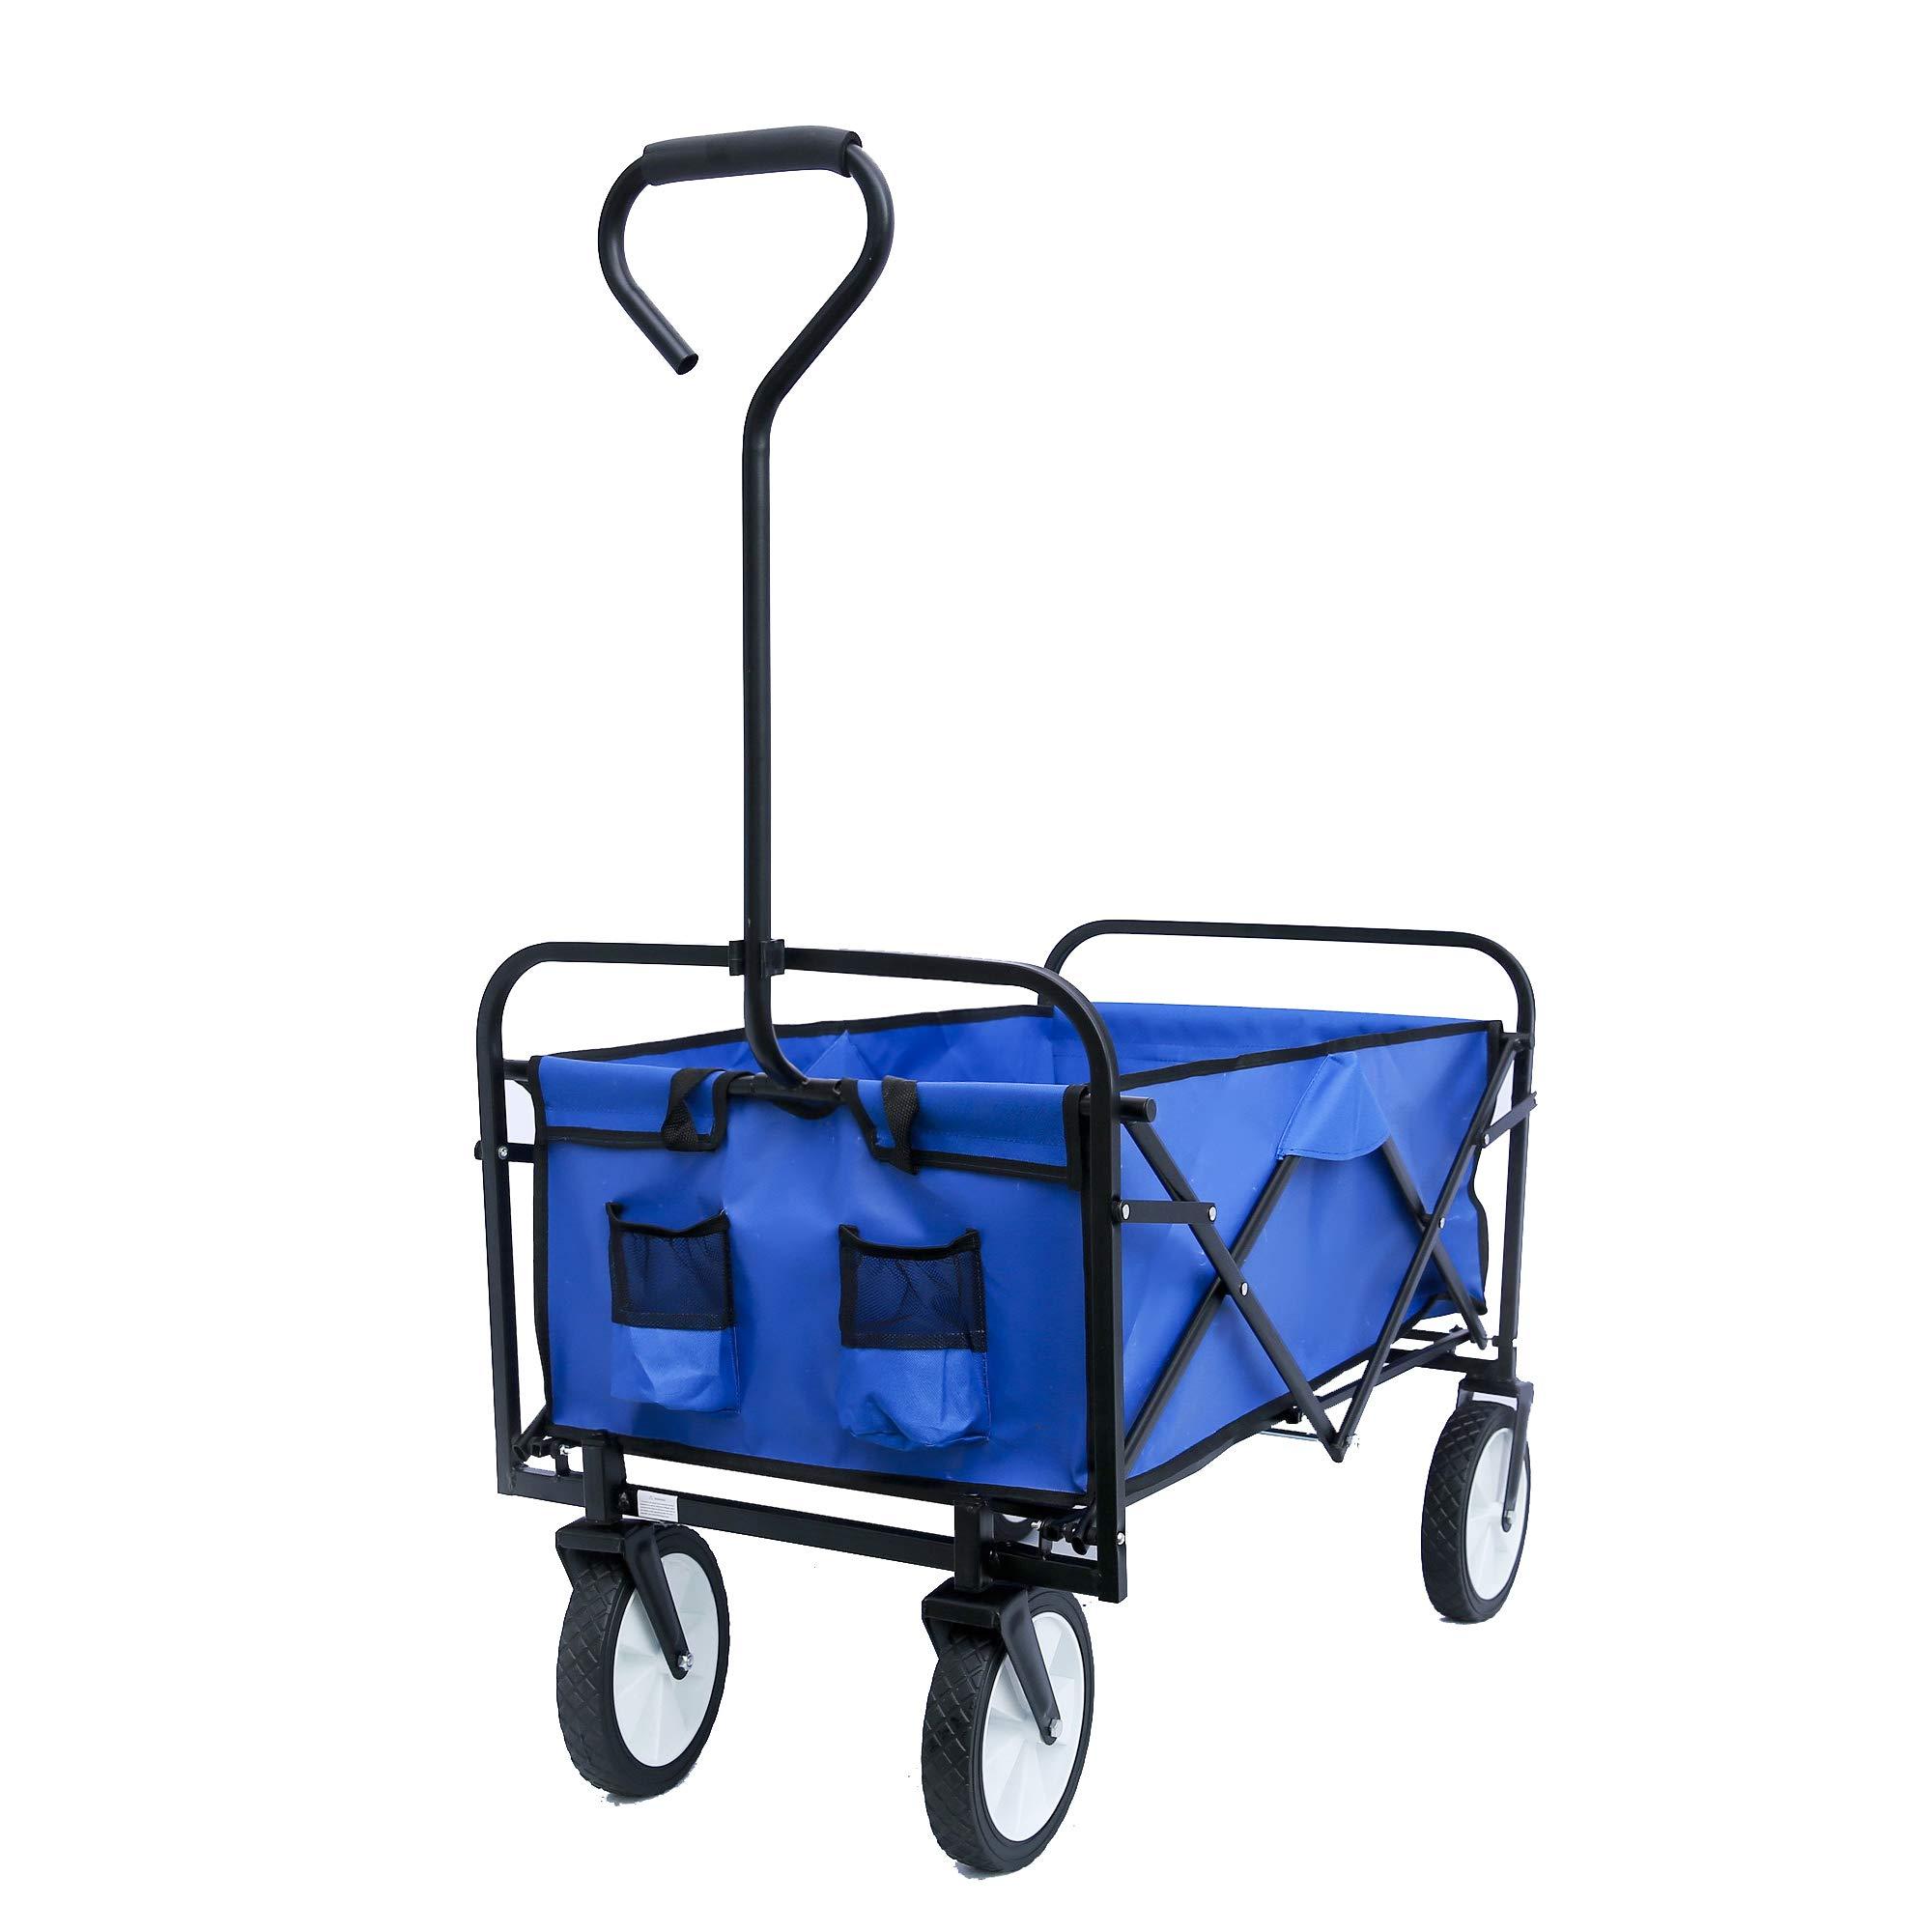 Folding Wagon, Garden Cart Heavy Duty Collapsible Folding All Terrain Utility Beach Garden Shopping, Utility Cart Collapsible (Blue) by Comp Life